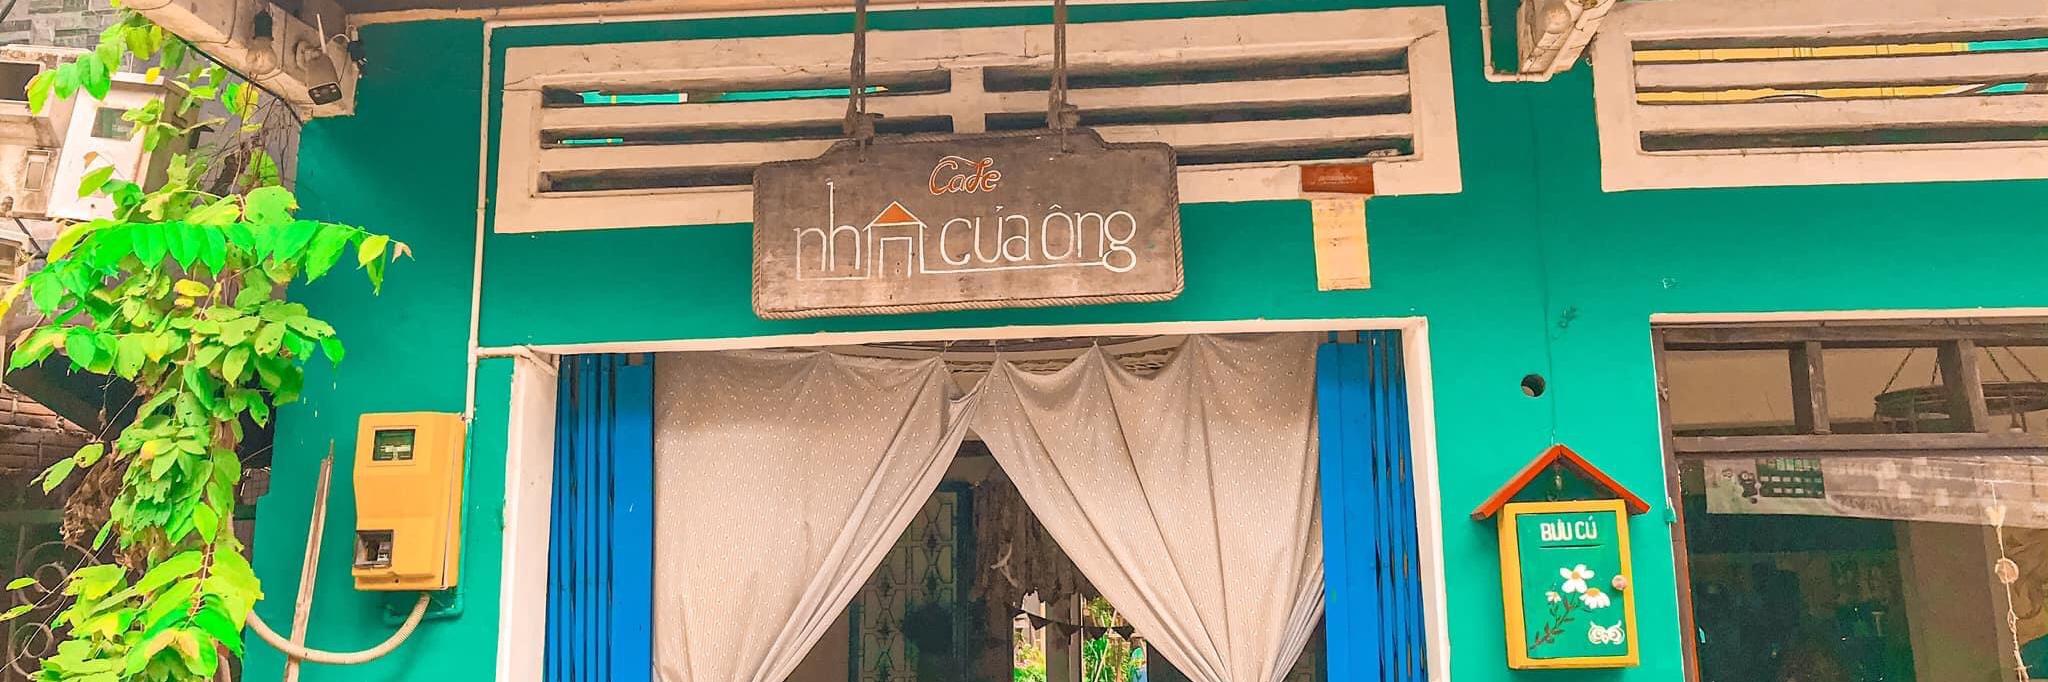 https://gody.vn/blog/congchua_mauhong803174/post/tro-ve-voi-nhung-ngay-xua-cu-o-nha-cua-ong-9018